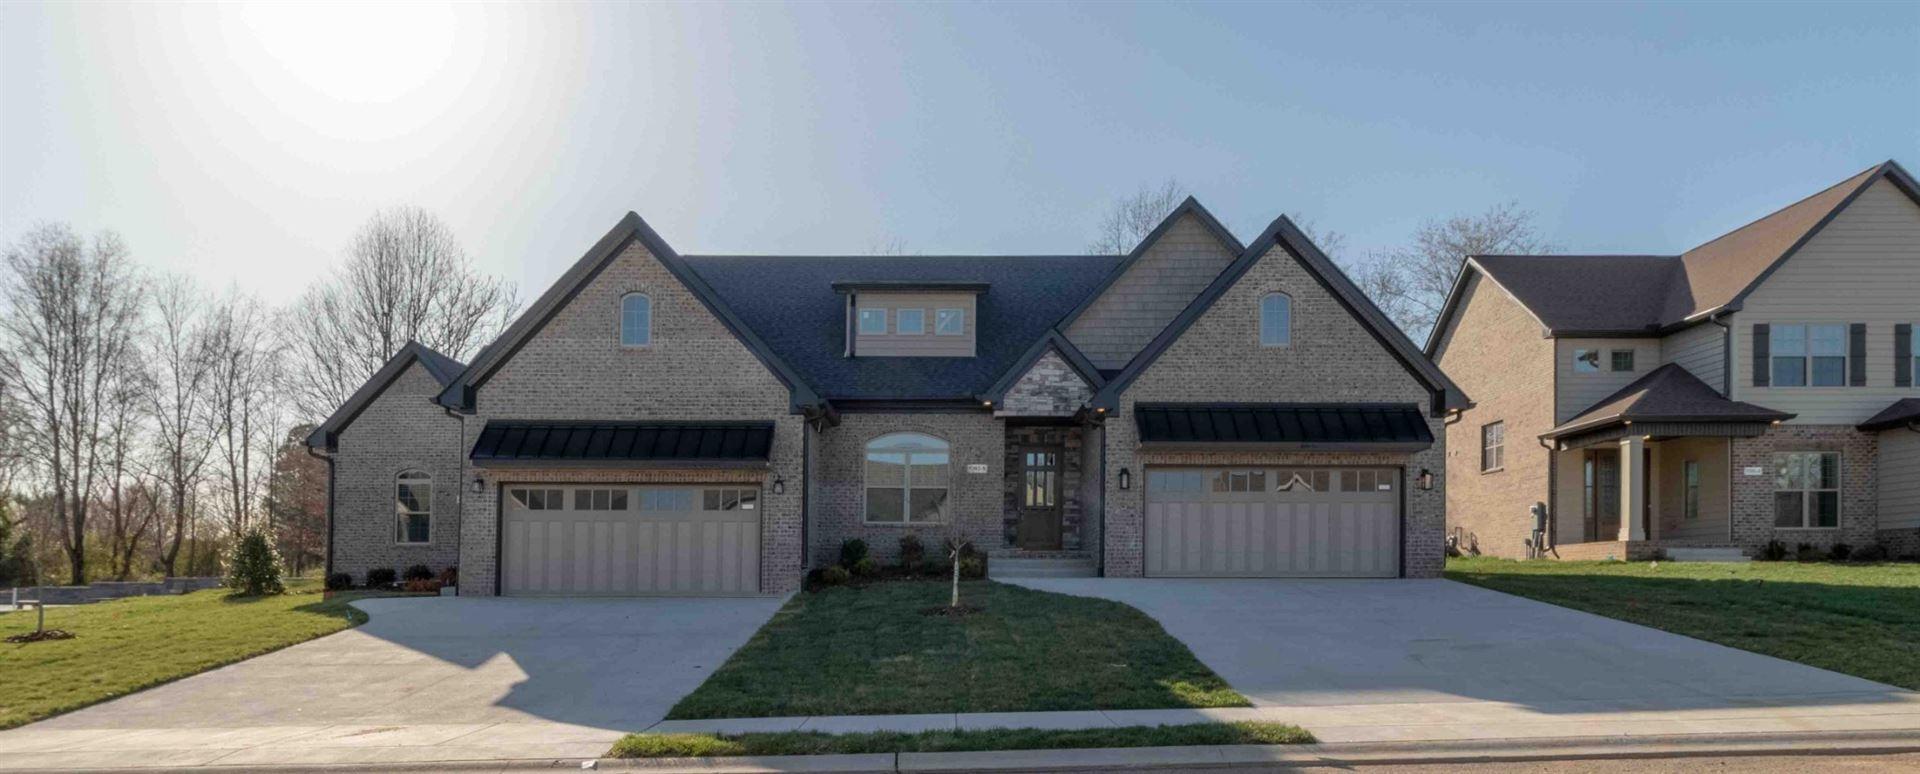 1092 Veridian Drive Unit 27A, Clarksville, TN 37043 - MLS#: 2274633